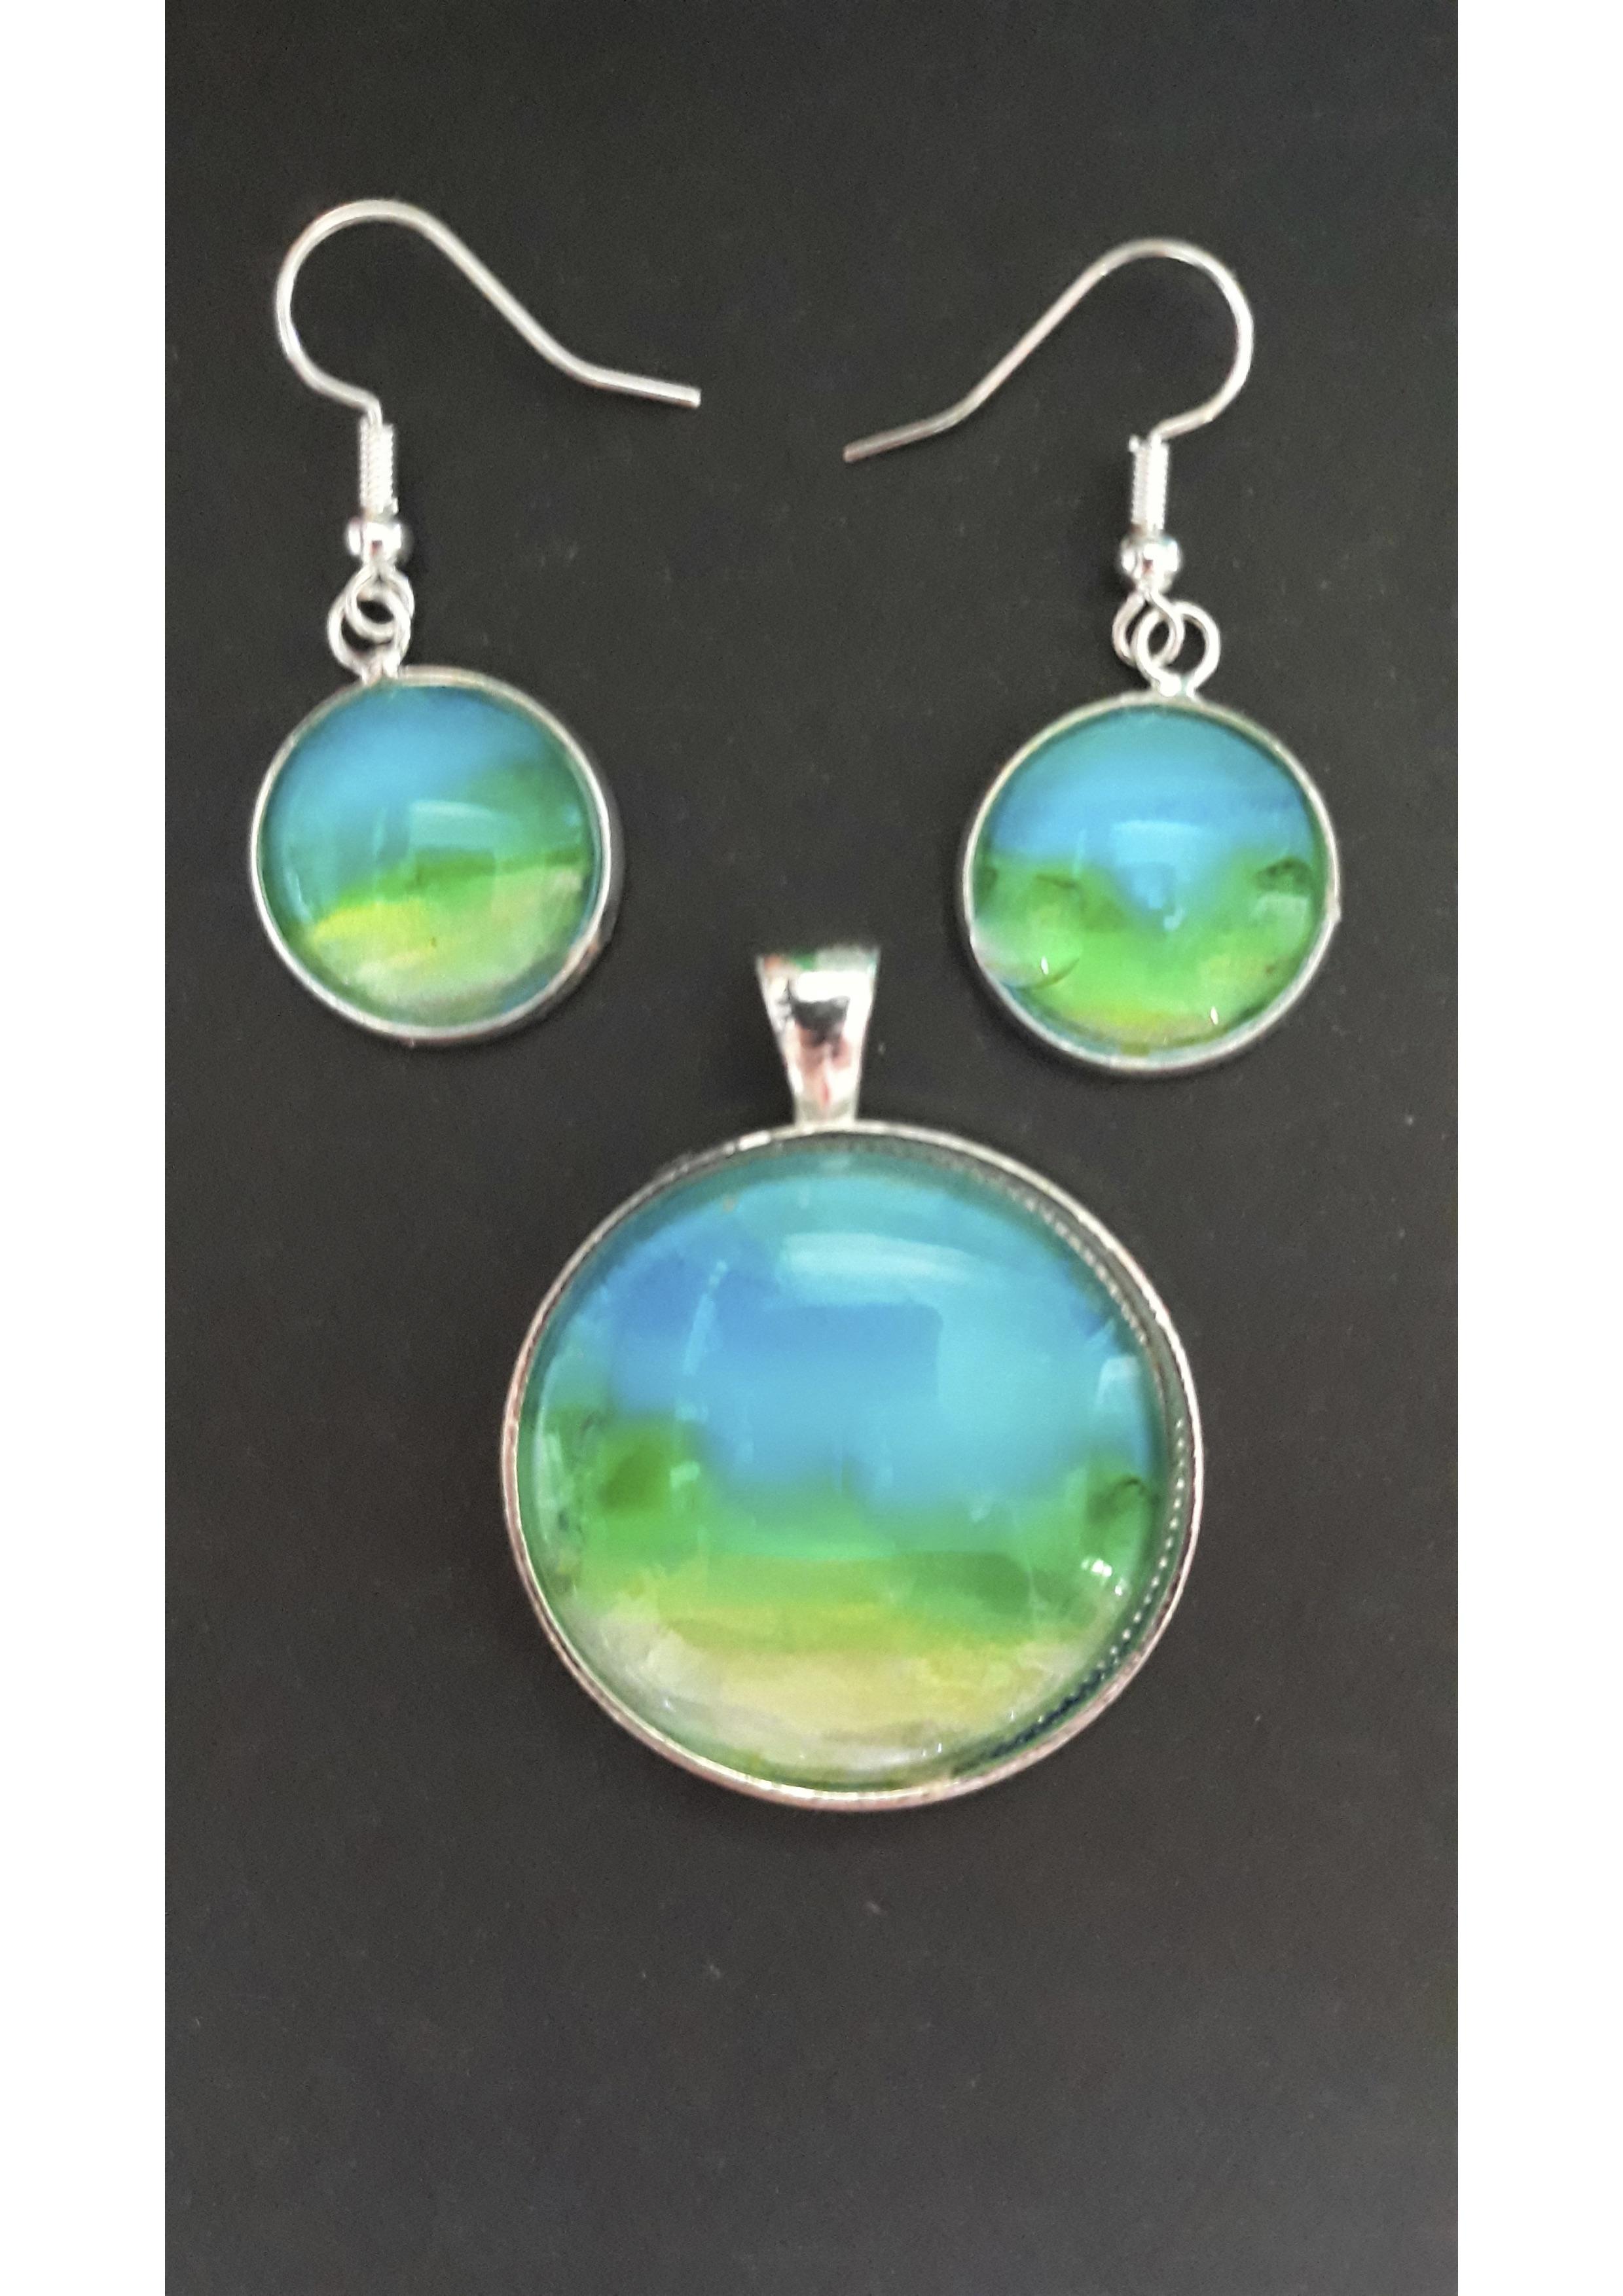 Art & Craft 311 Jewellery by Rosie Kaplan